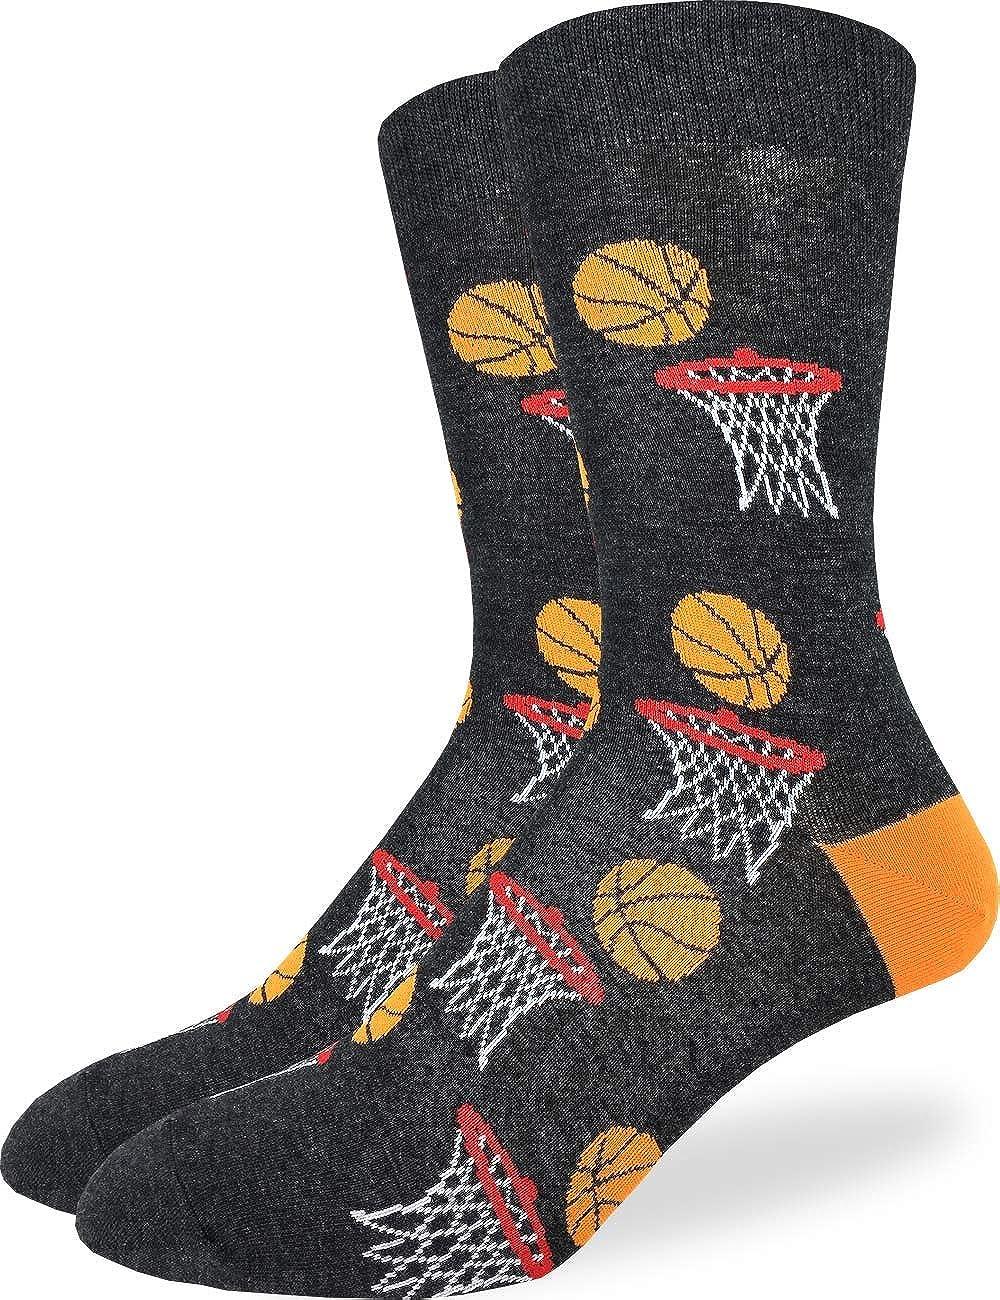 Size 13-17 Good Luck Sock Mens Extra Large Basketball Socks Big /& Tall